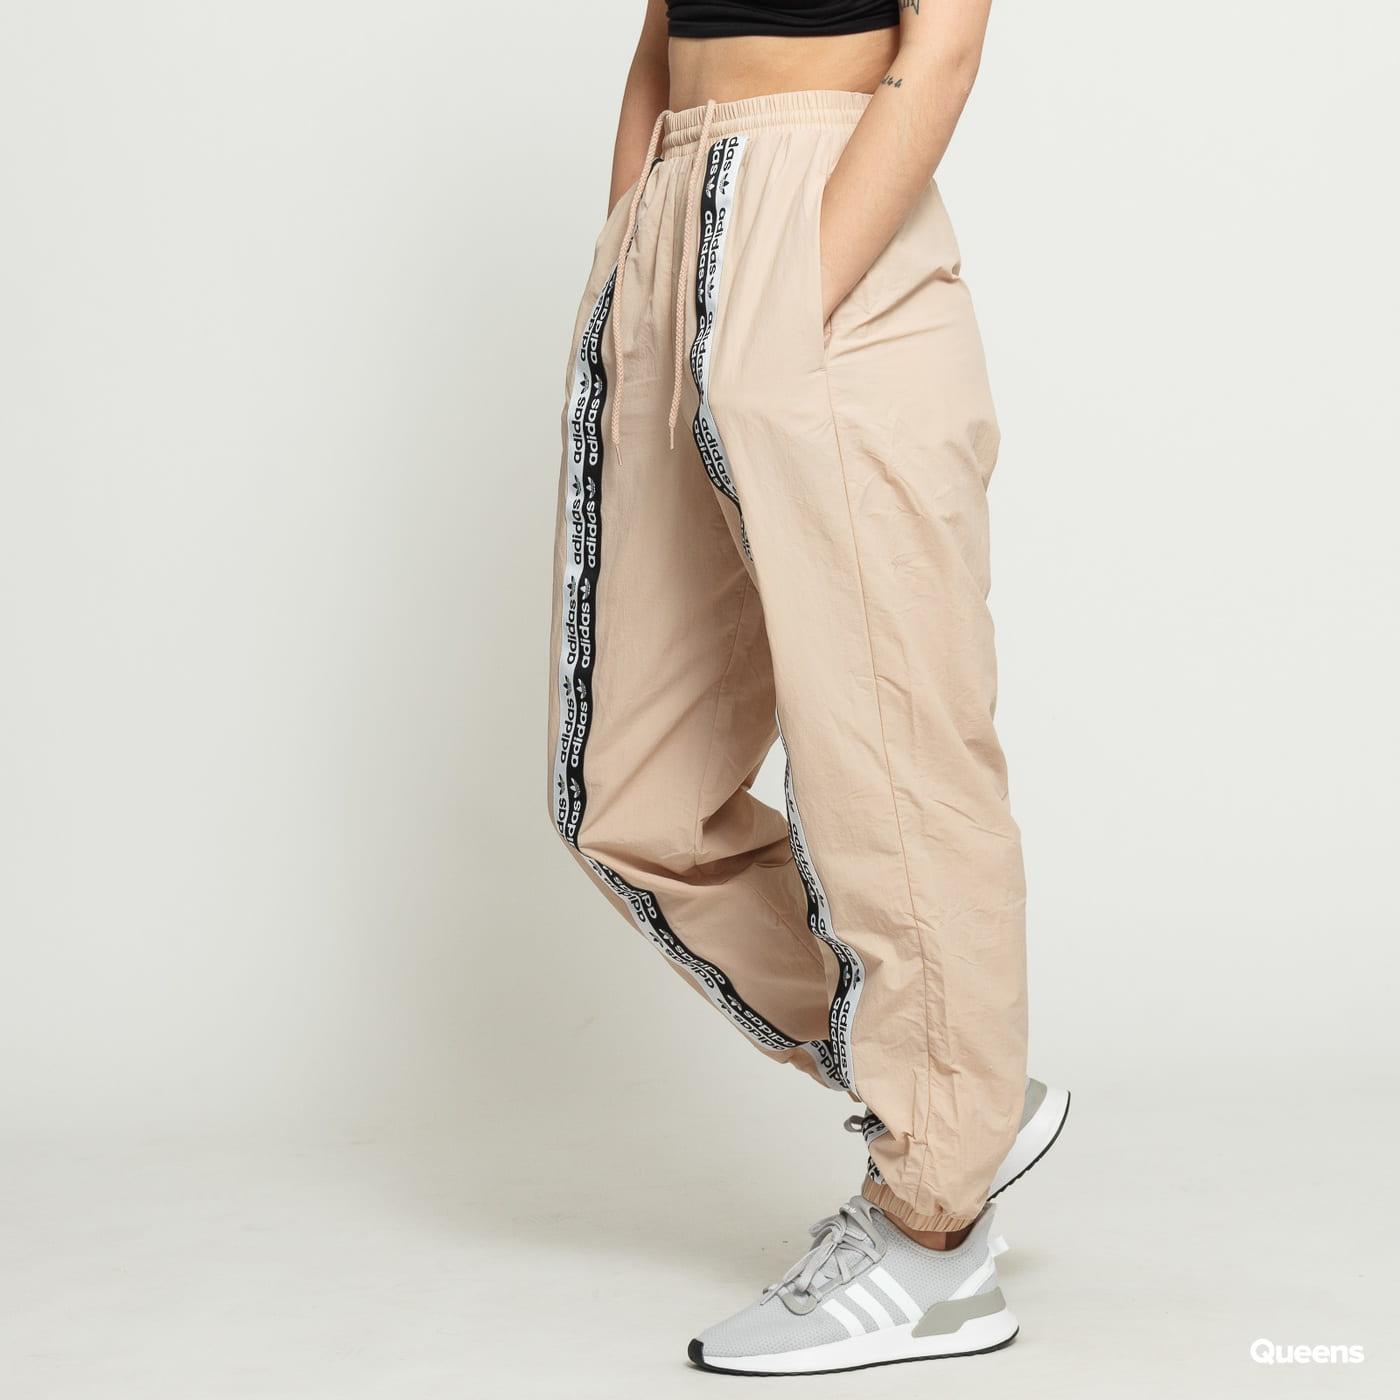 231ddf26c6 adidas Originals Track Pants light beige